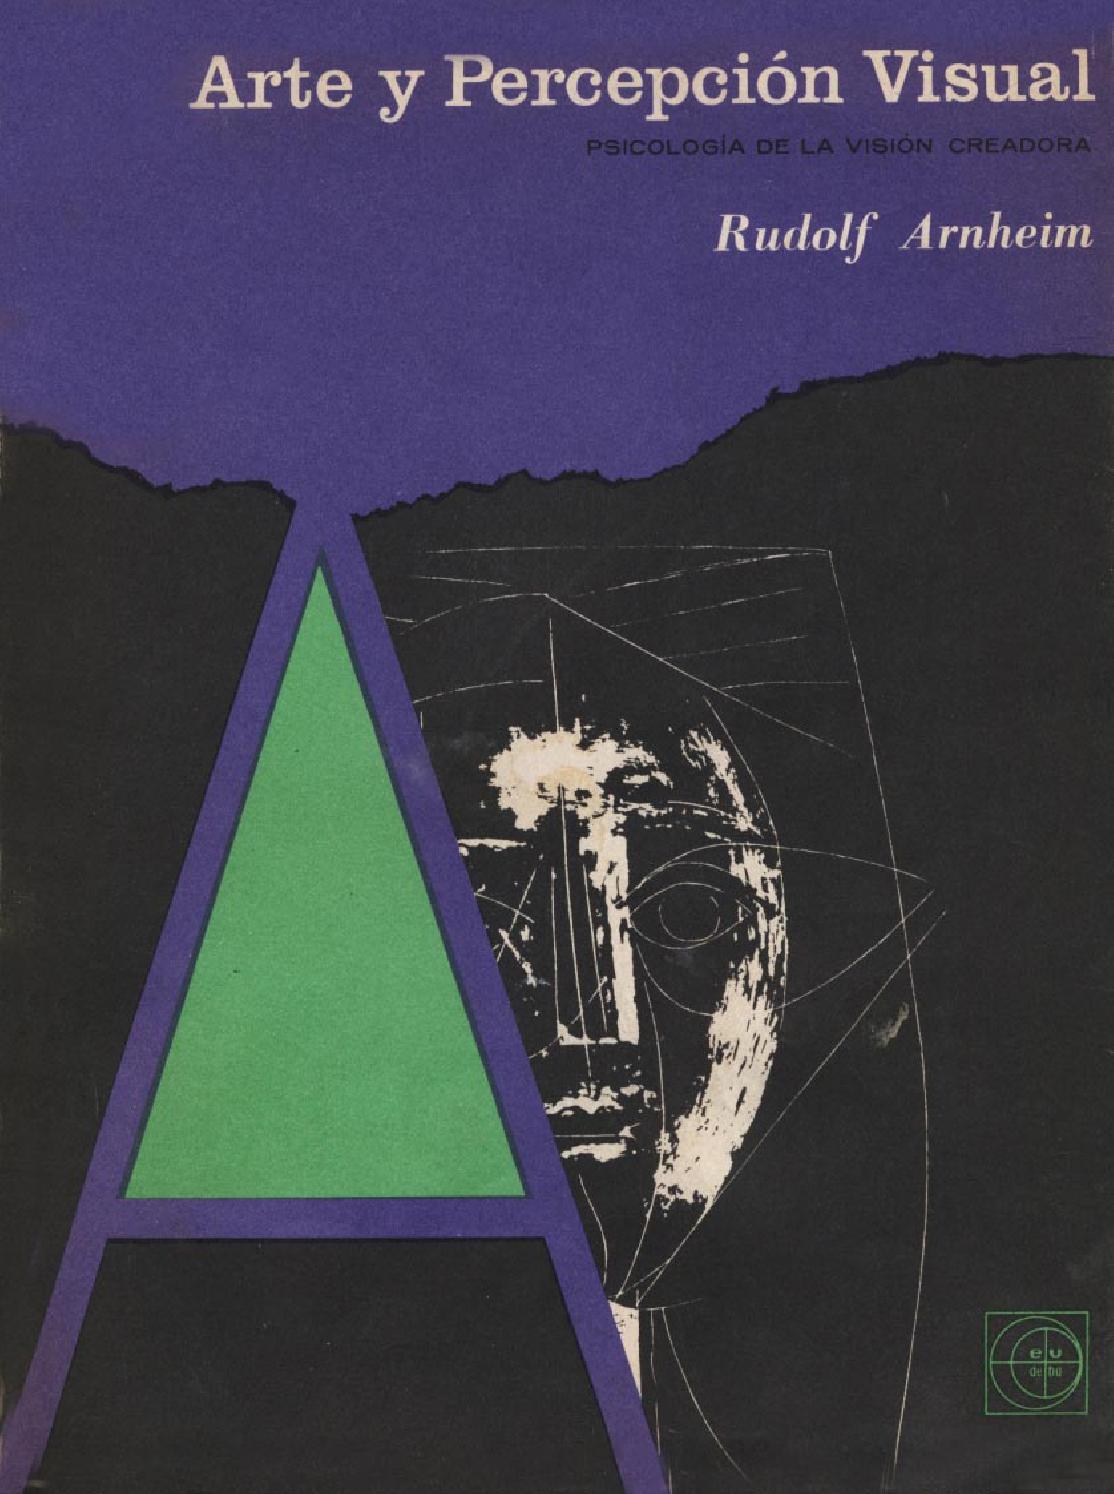 84f50590250f9 Rudolf arnheim arte y percepcion visual (2) by Jorge Carlos Alvino Loli -  issuu